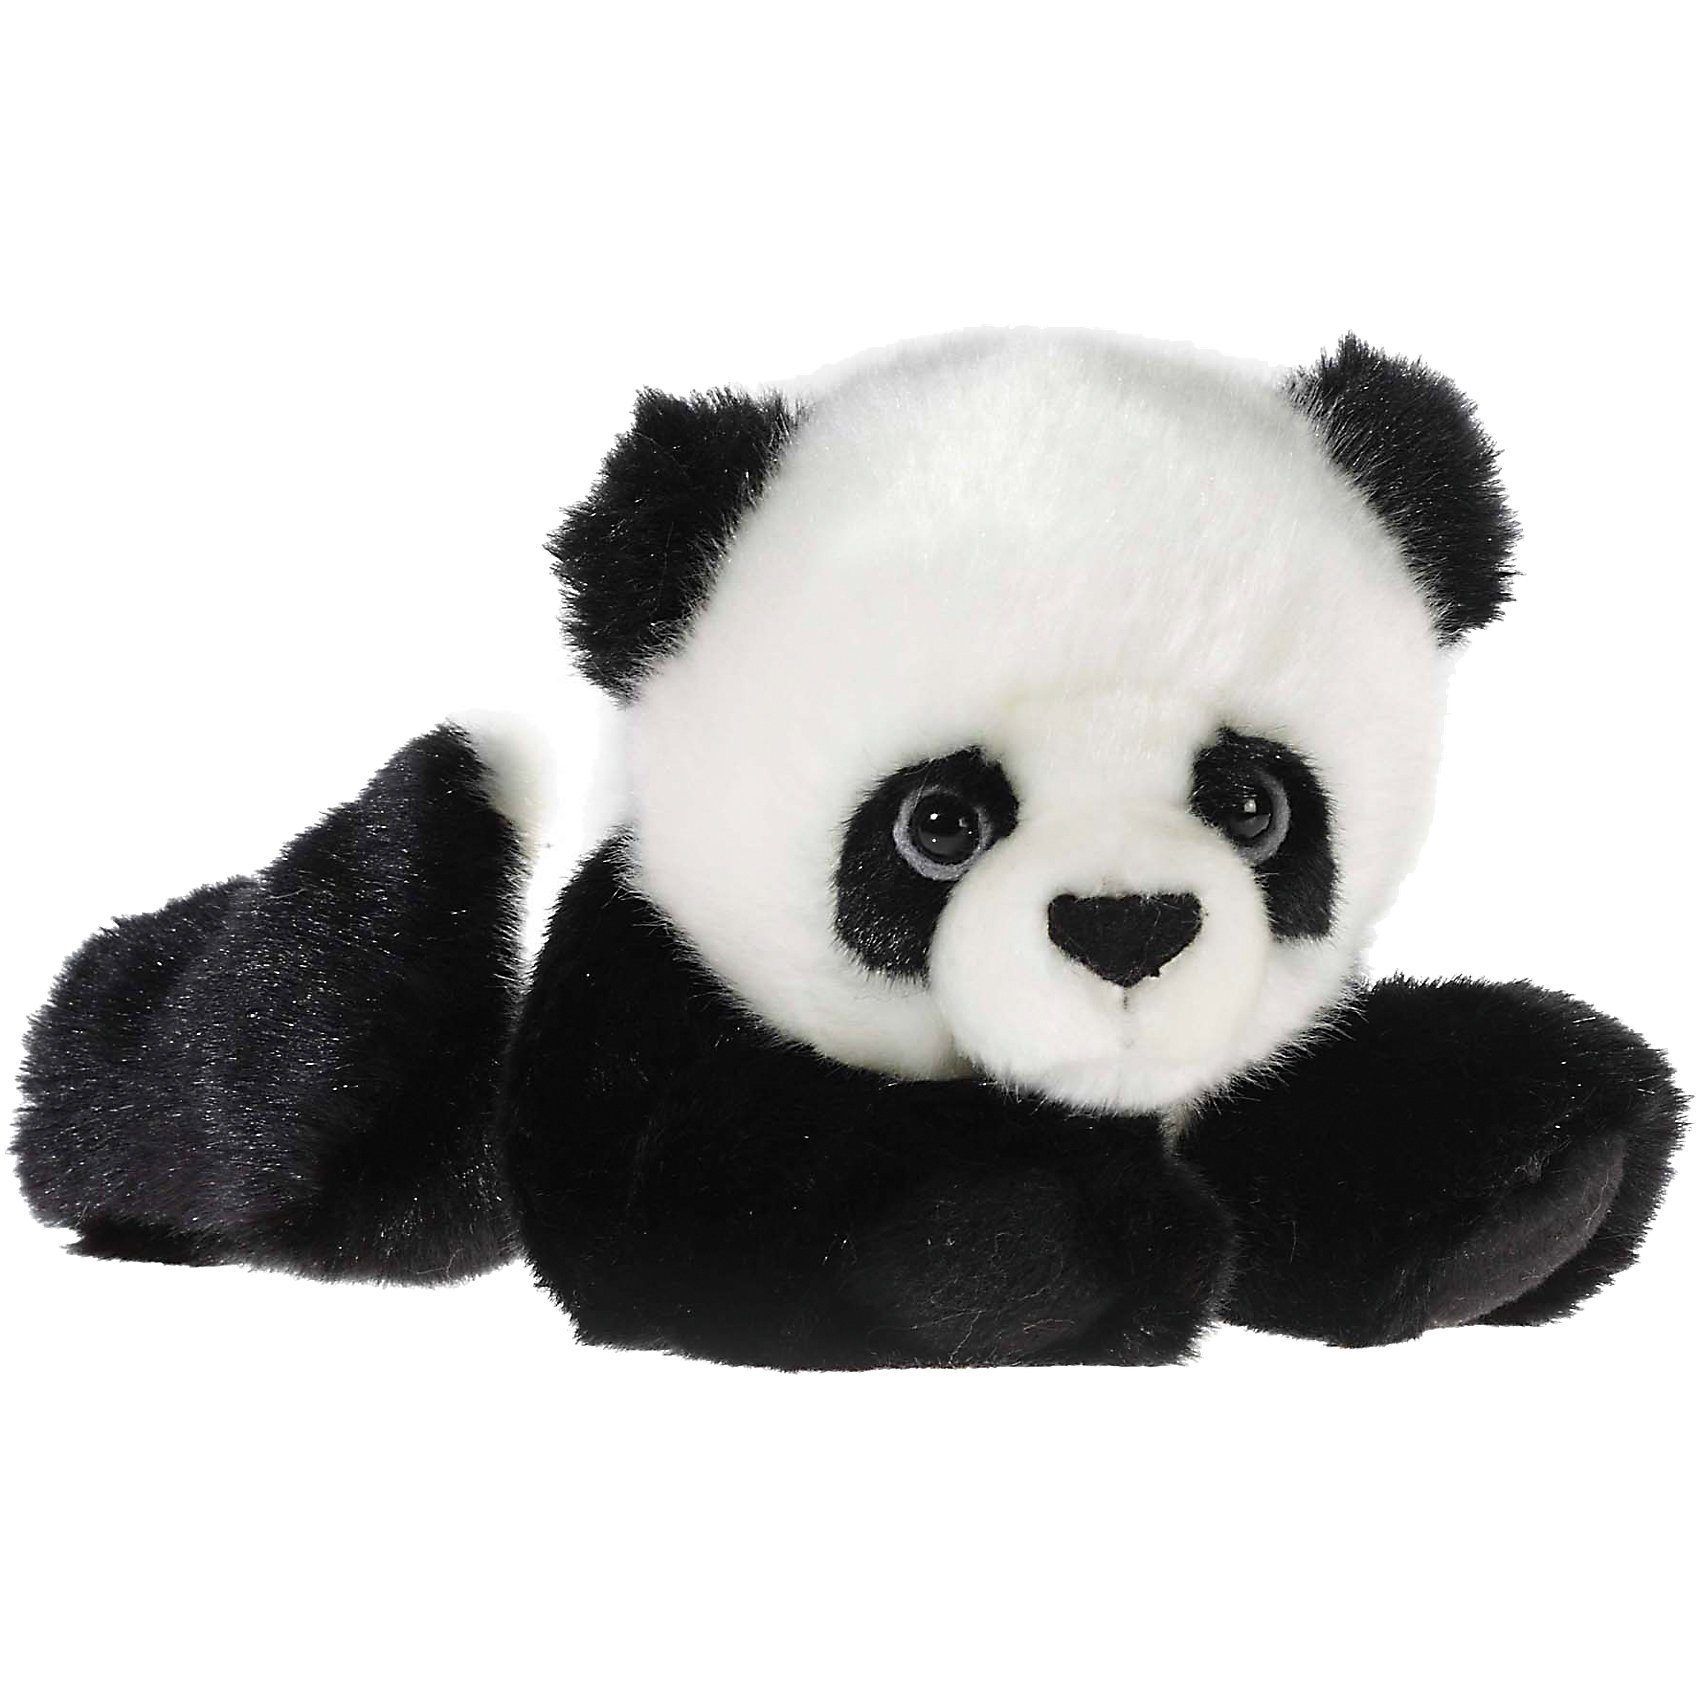 Heunec MI CLASSICO Baby Panda Bär liegend